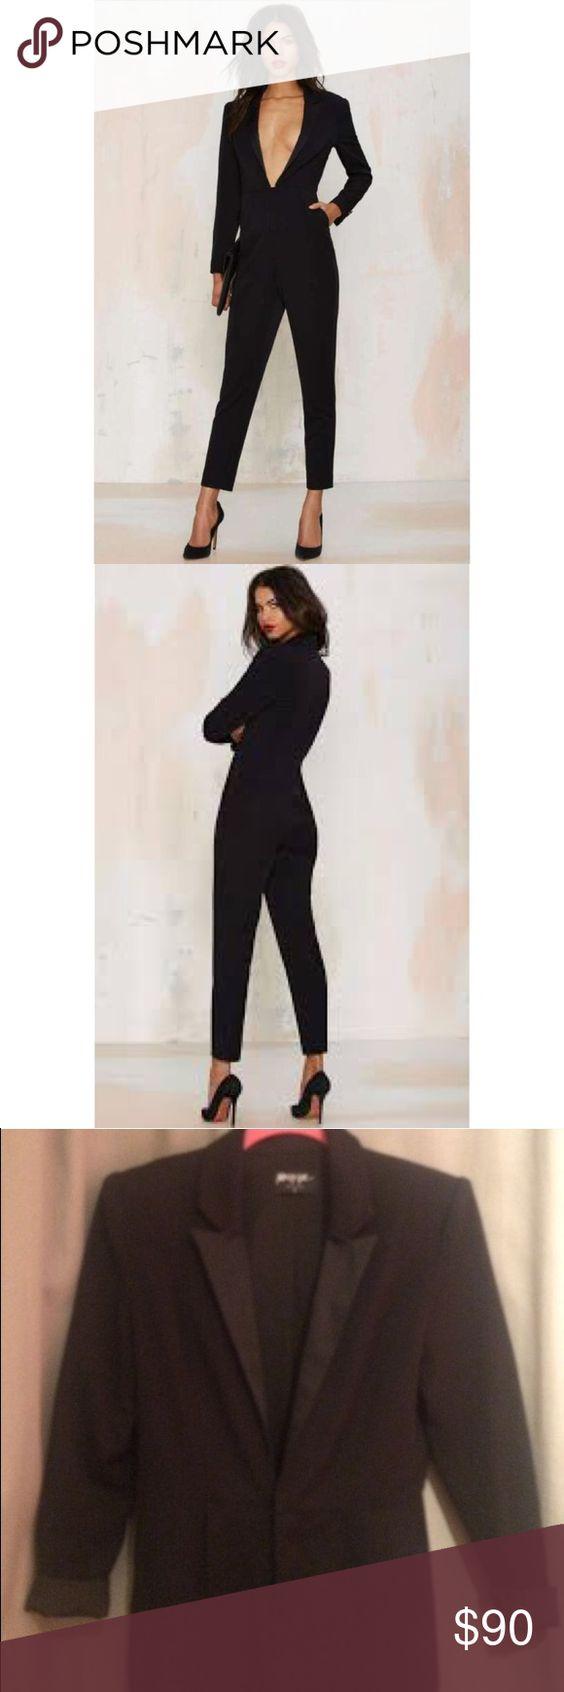 374ac23b857 Nasty Gal Like a Boss Tuxedo Jumpsuit